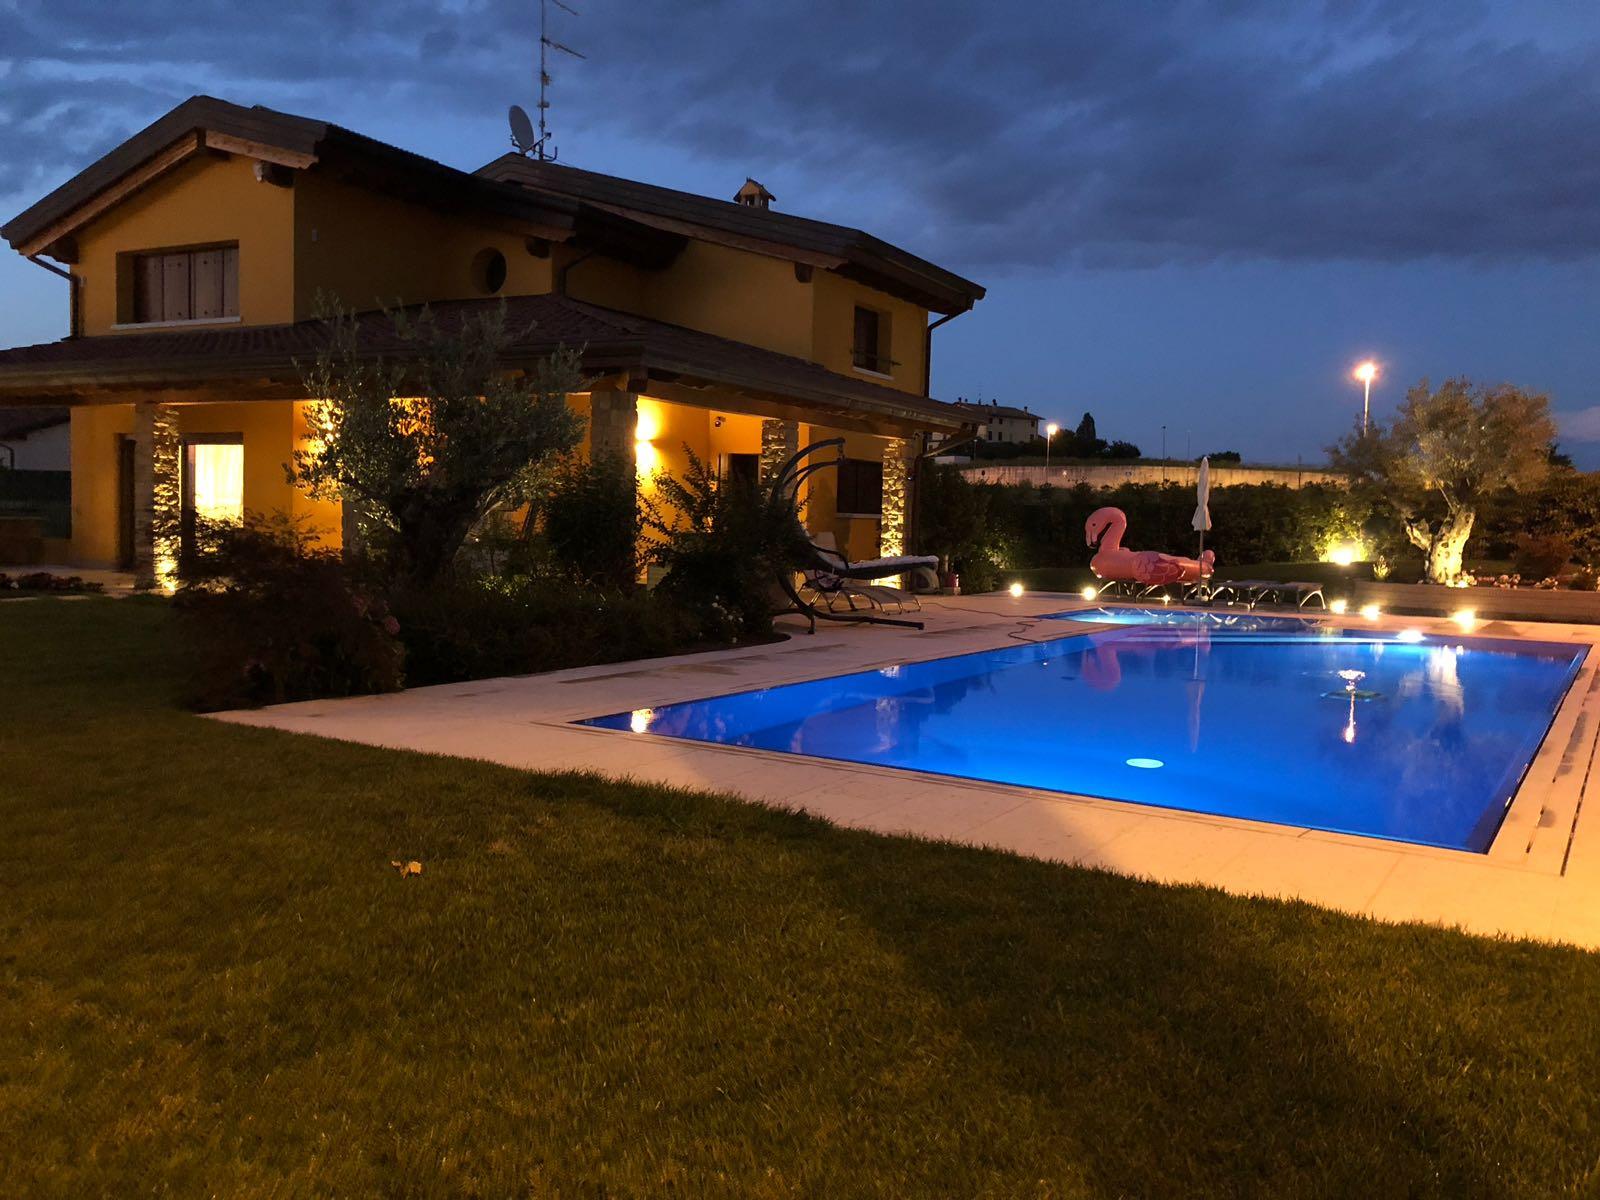 Atmosfera a bordo piscina con rivestimento blu e lamapde a LED a basso consumo energetico